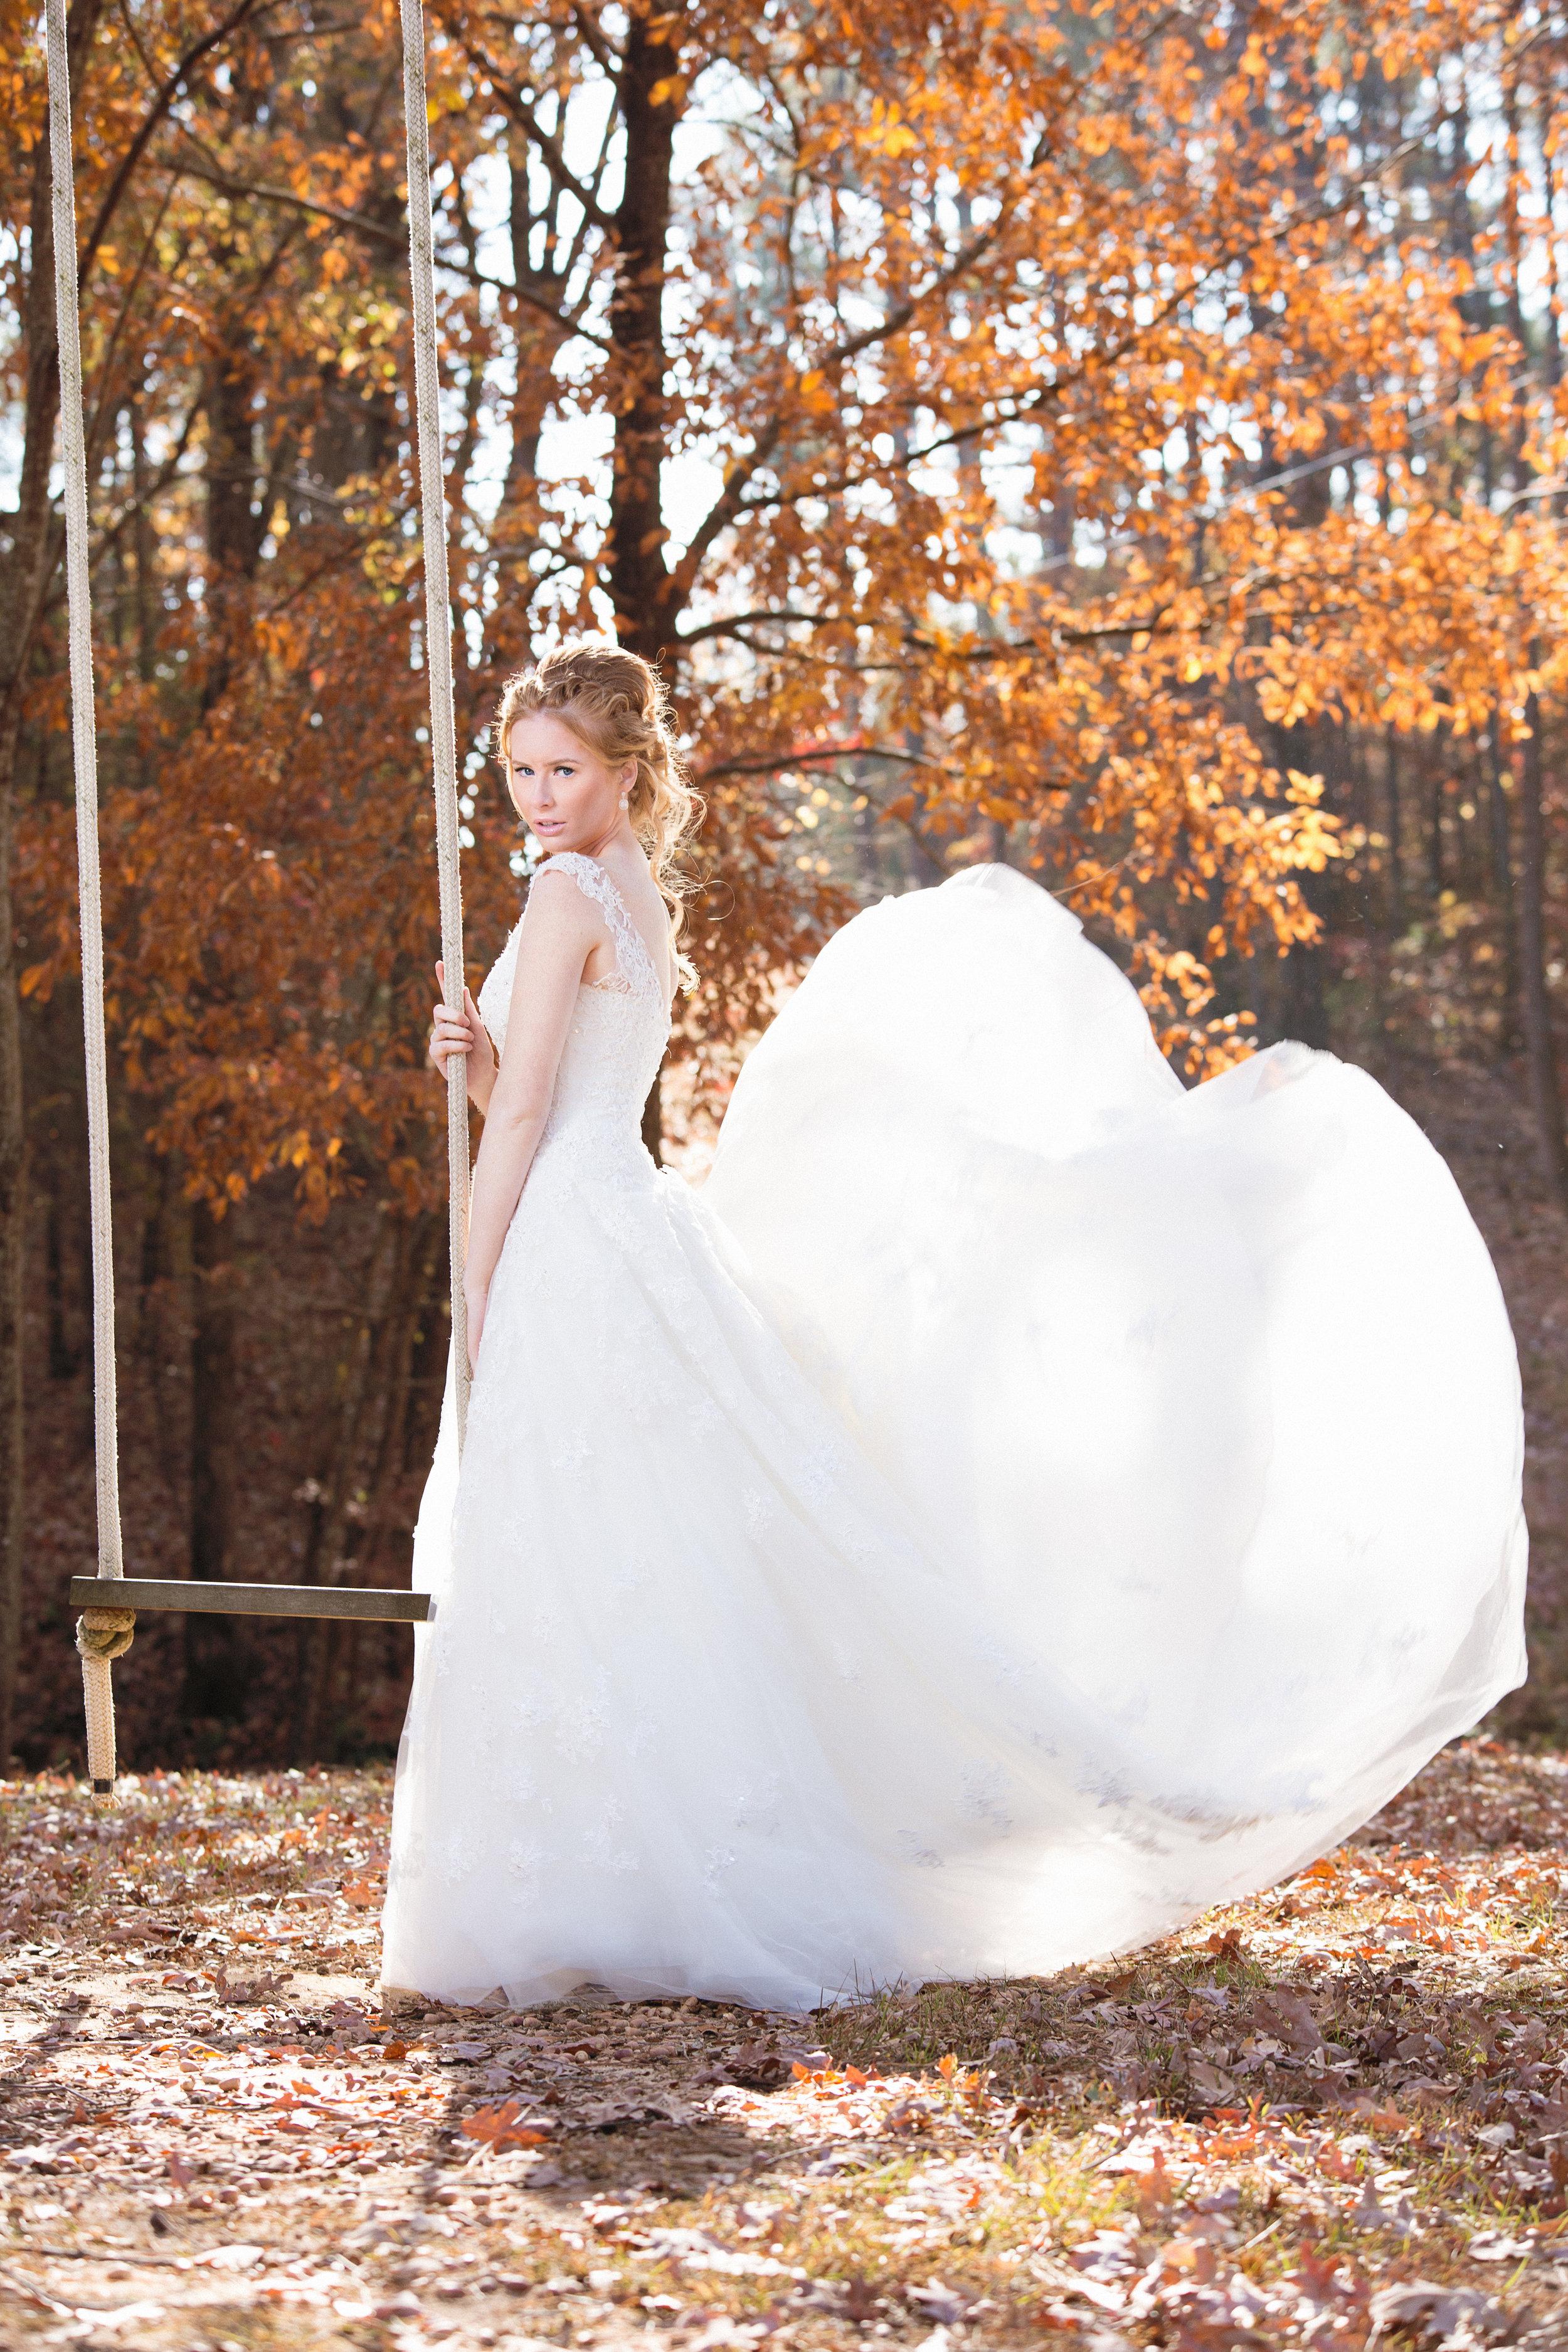 Pheauxtography_WeddingConcept-2.jpg